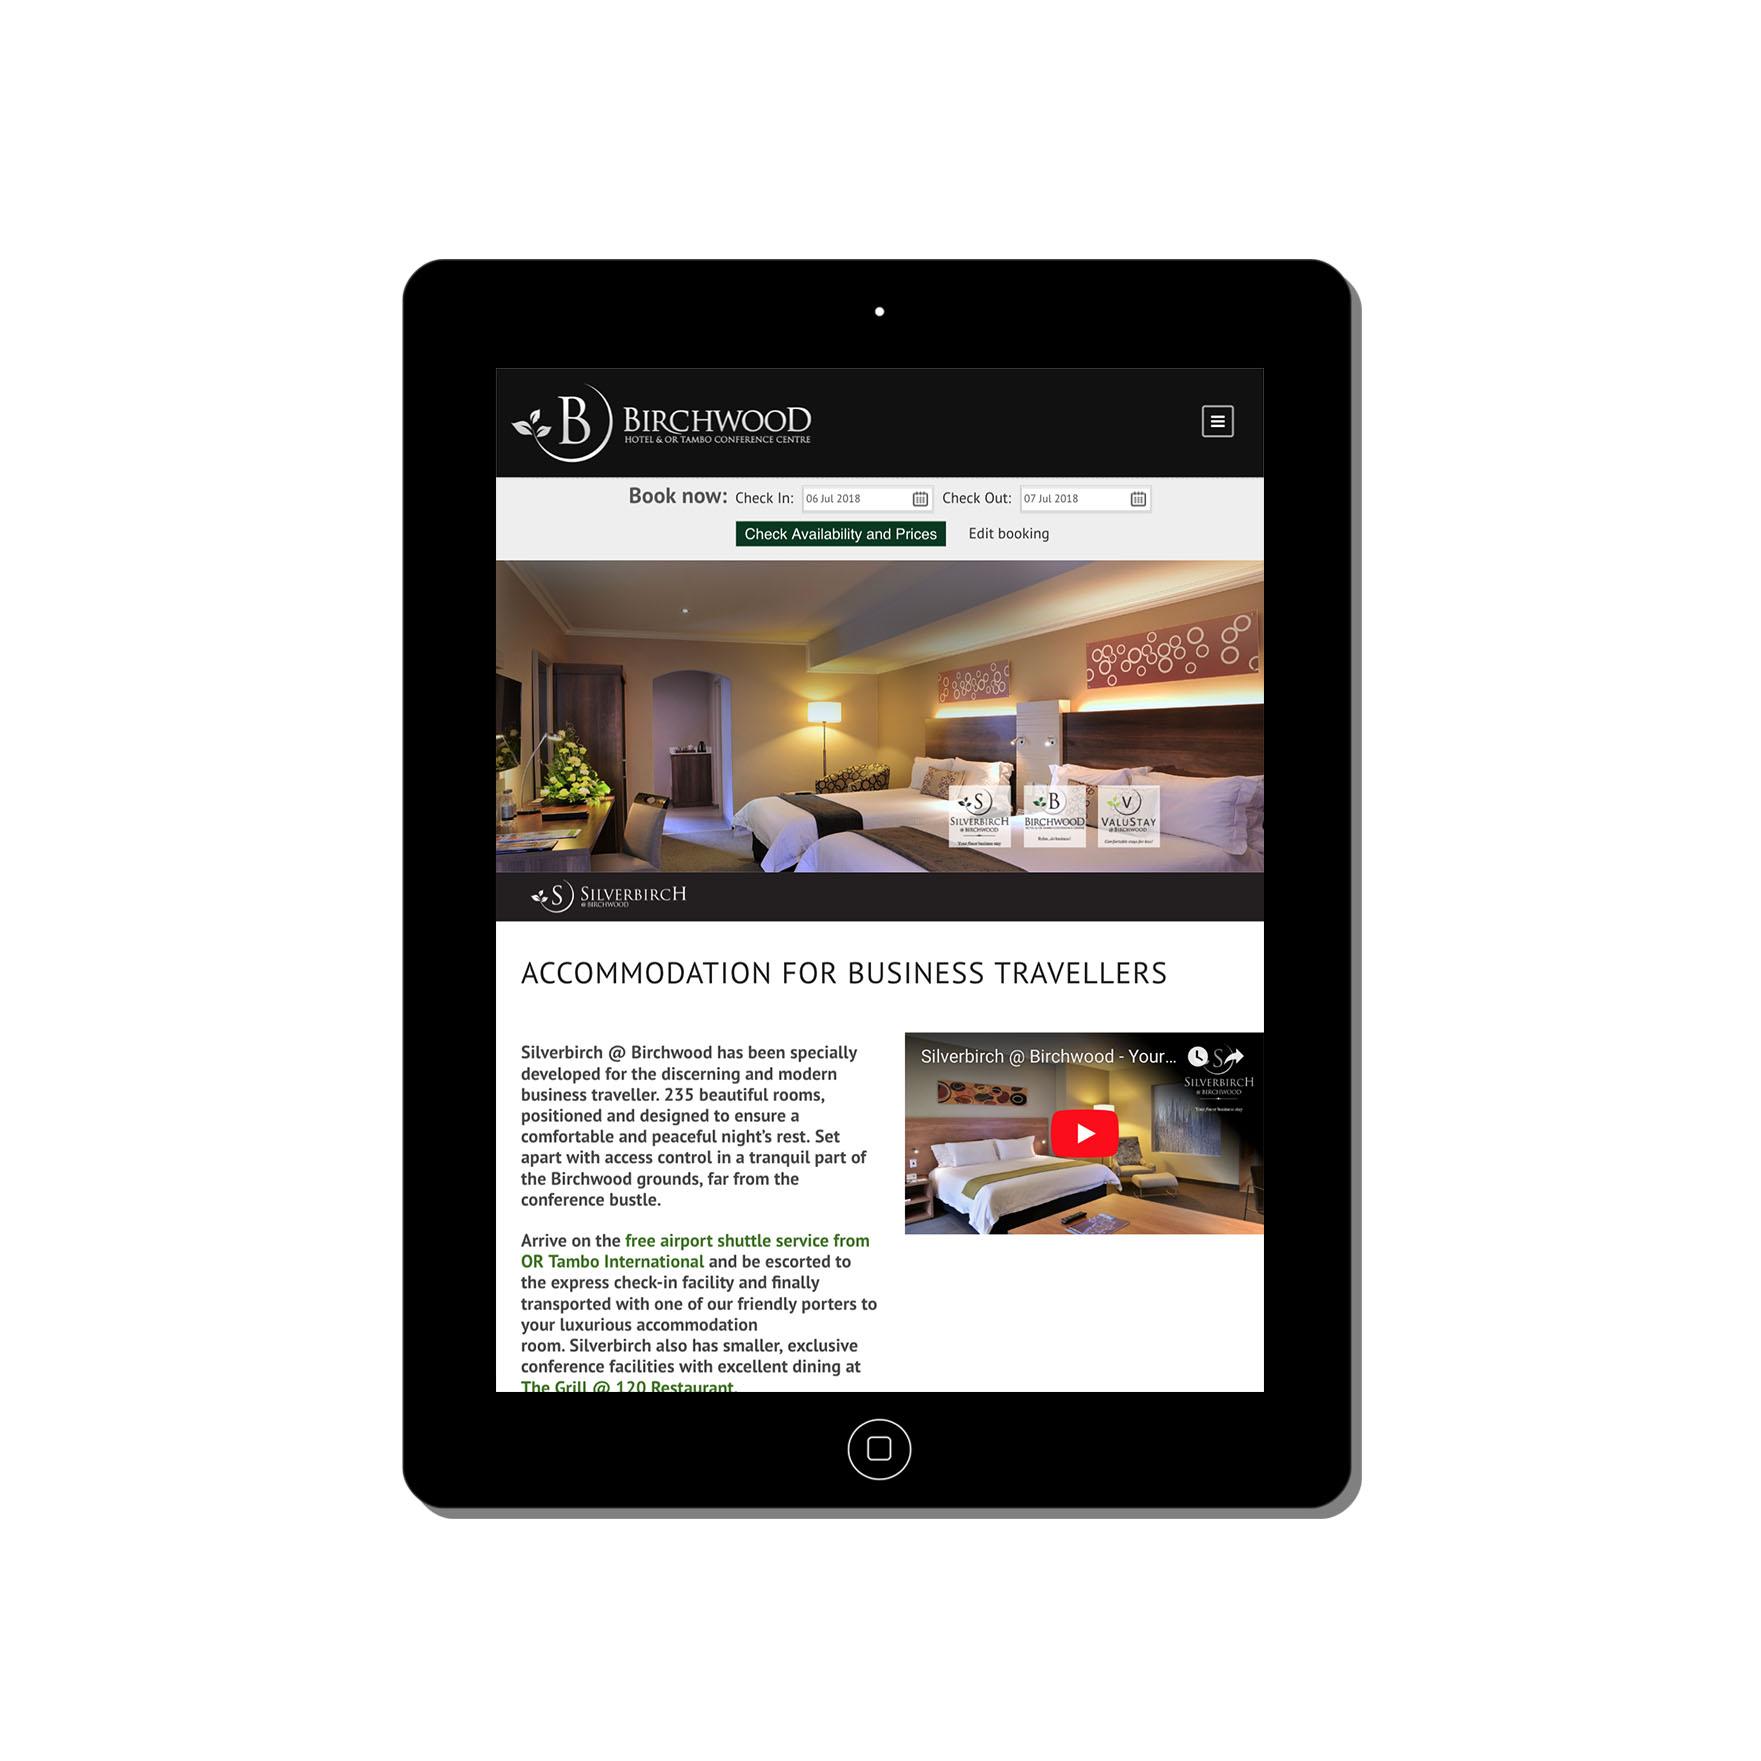 birchwood hotel or-tambo-conference-centre-web-design-portfolio-webdoor-responsive-web-design-agency-hillcrest-kwazulu-natal-tablet